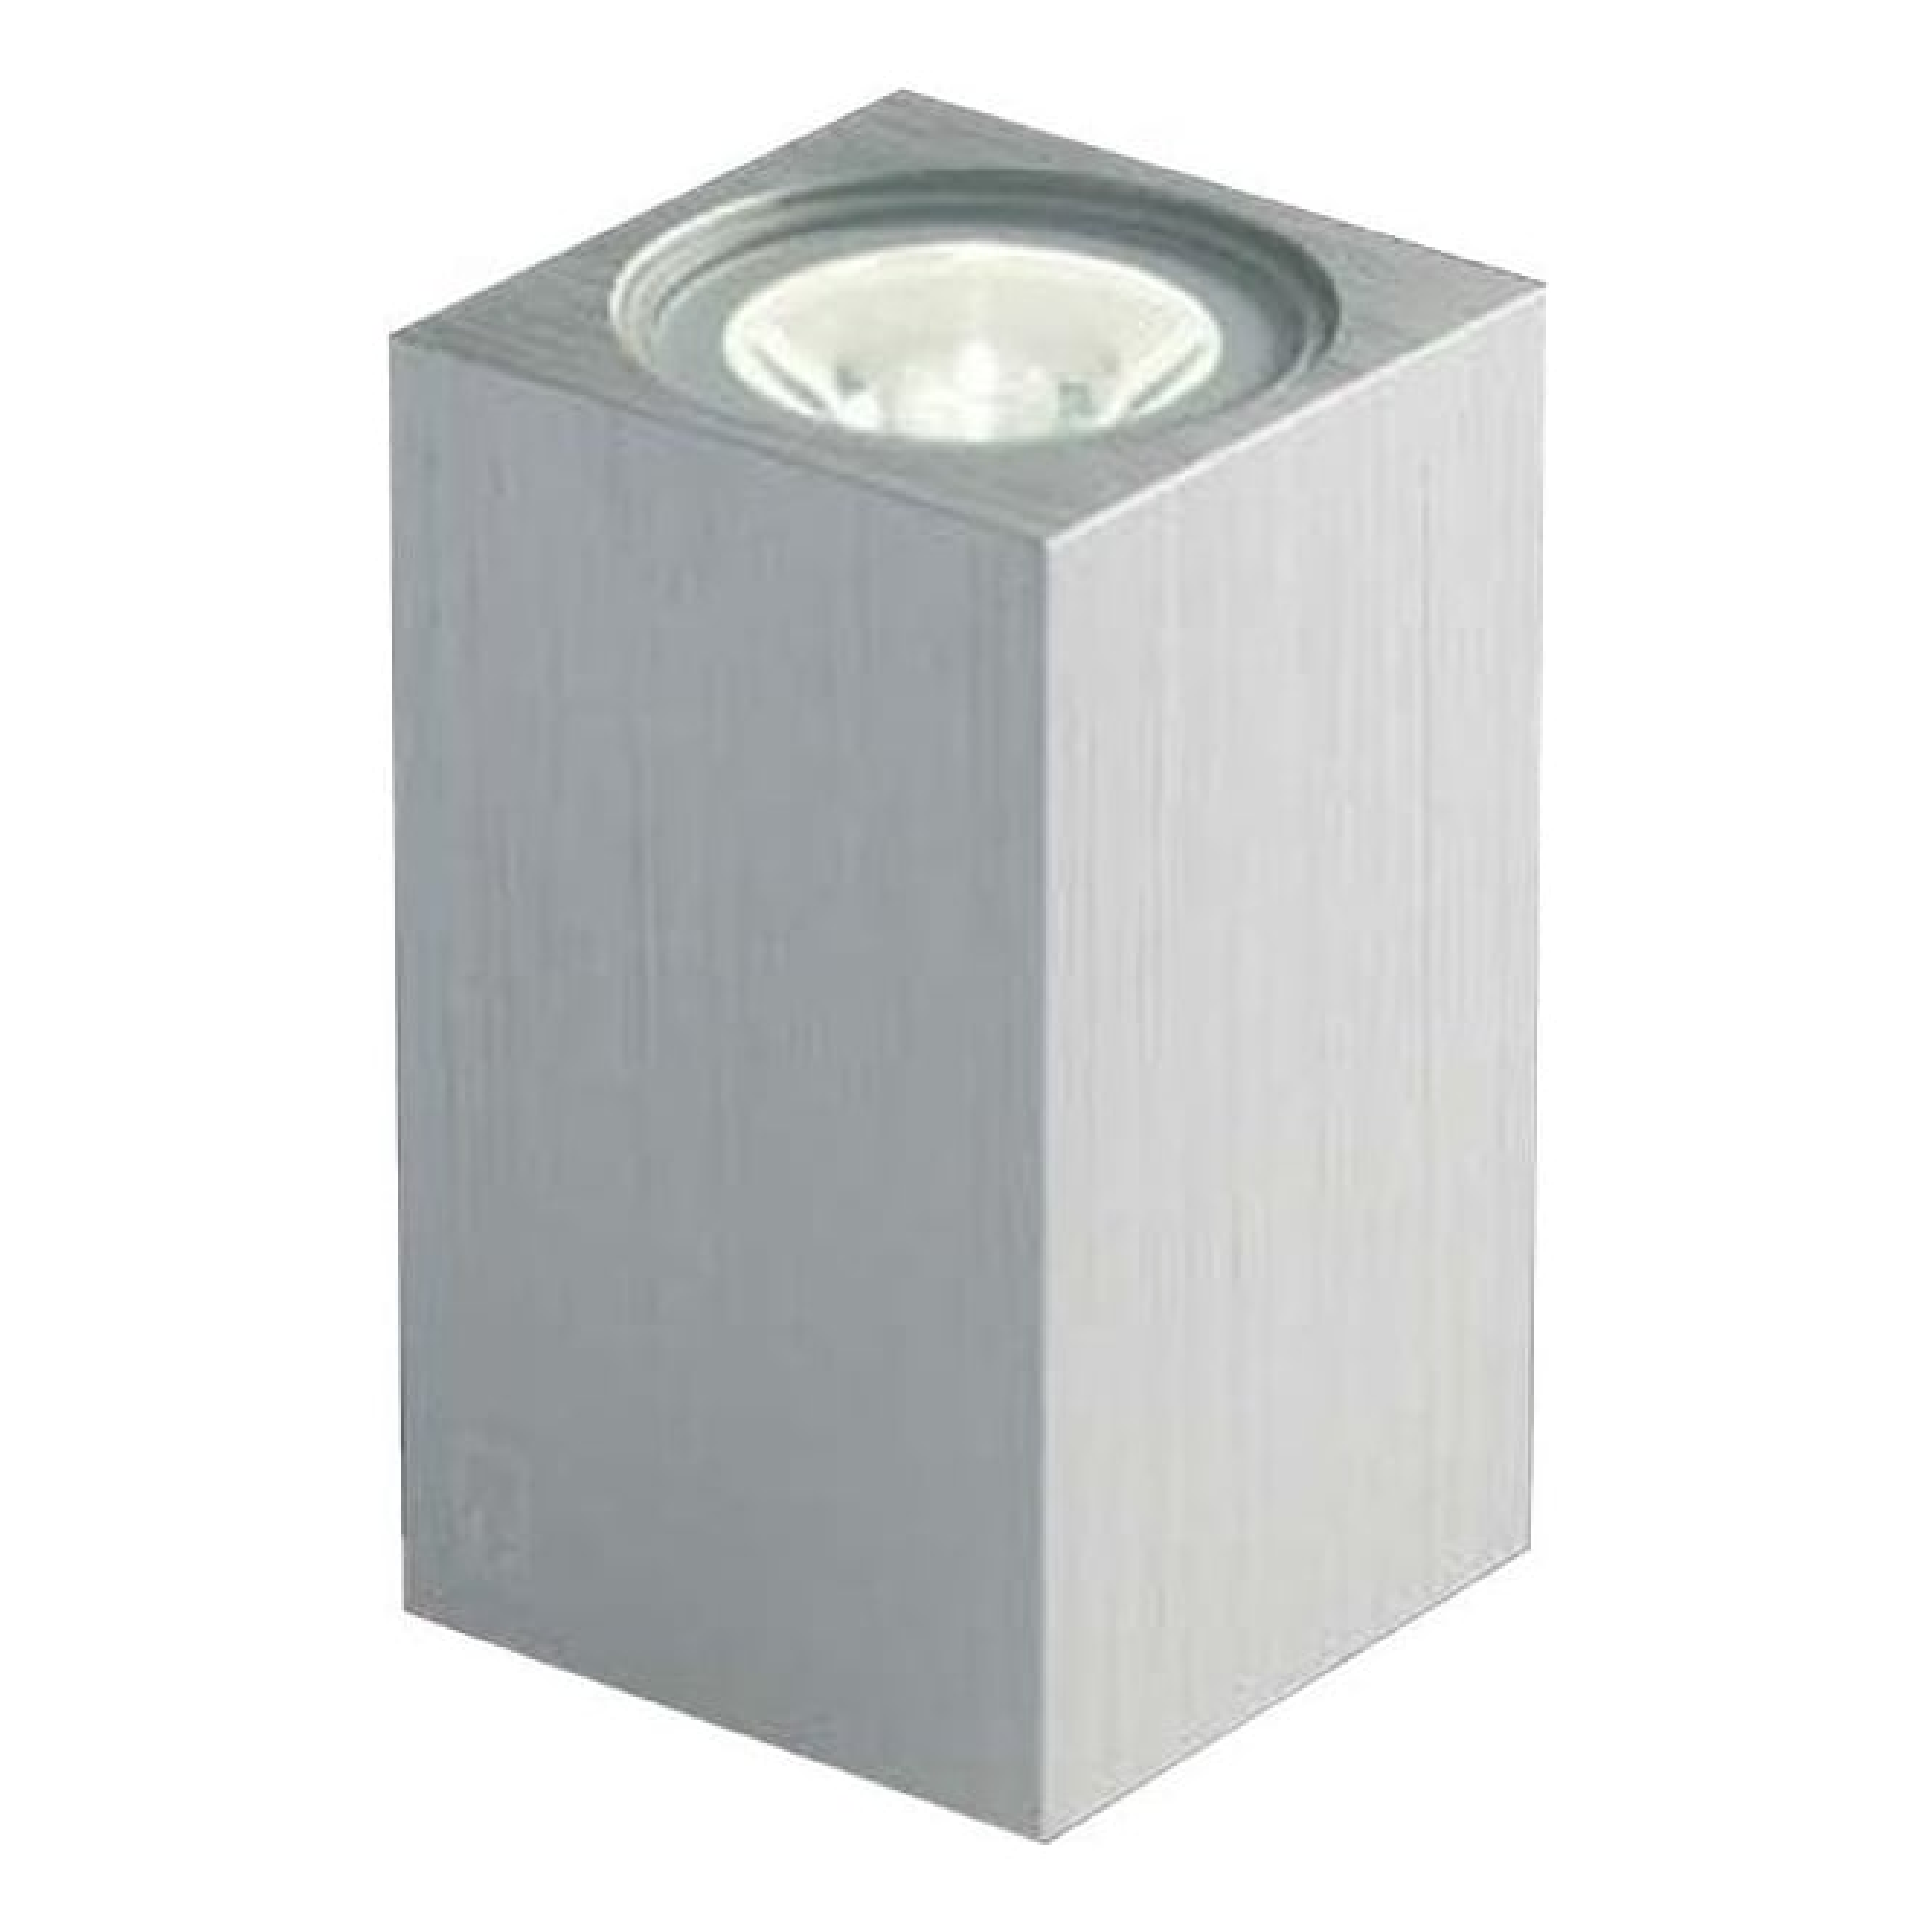 Collingwood Lighting MC020 S up/down mini cube LED wall light - Aluminium - Low voltage